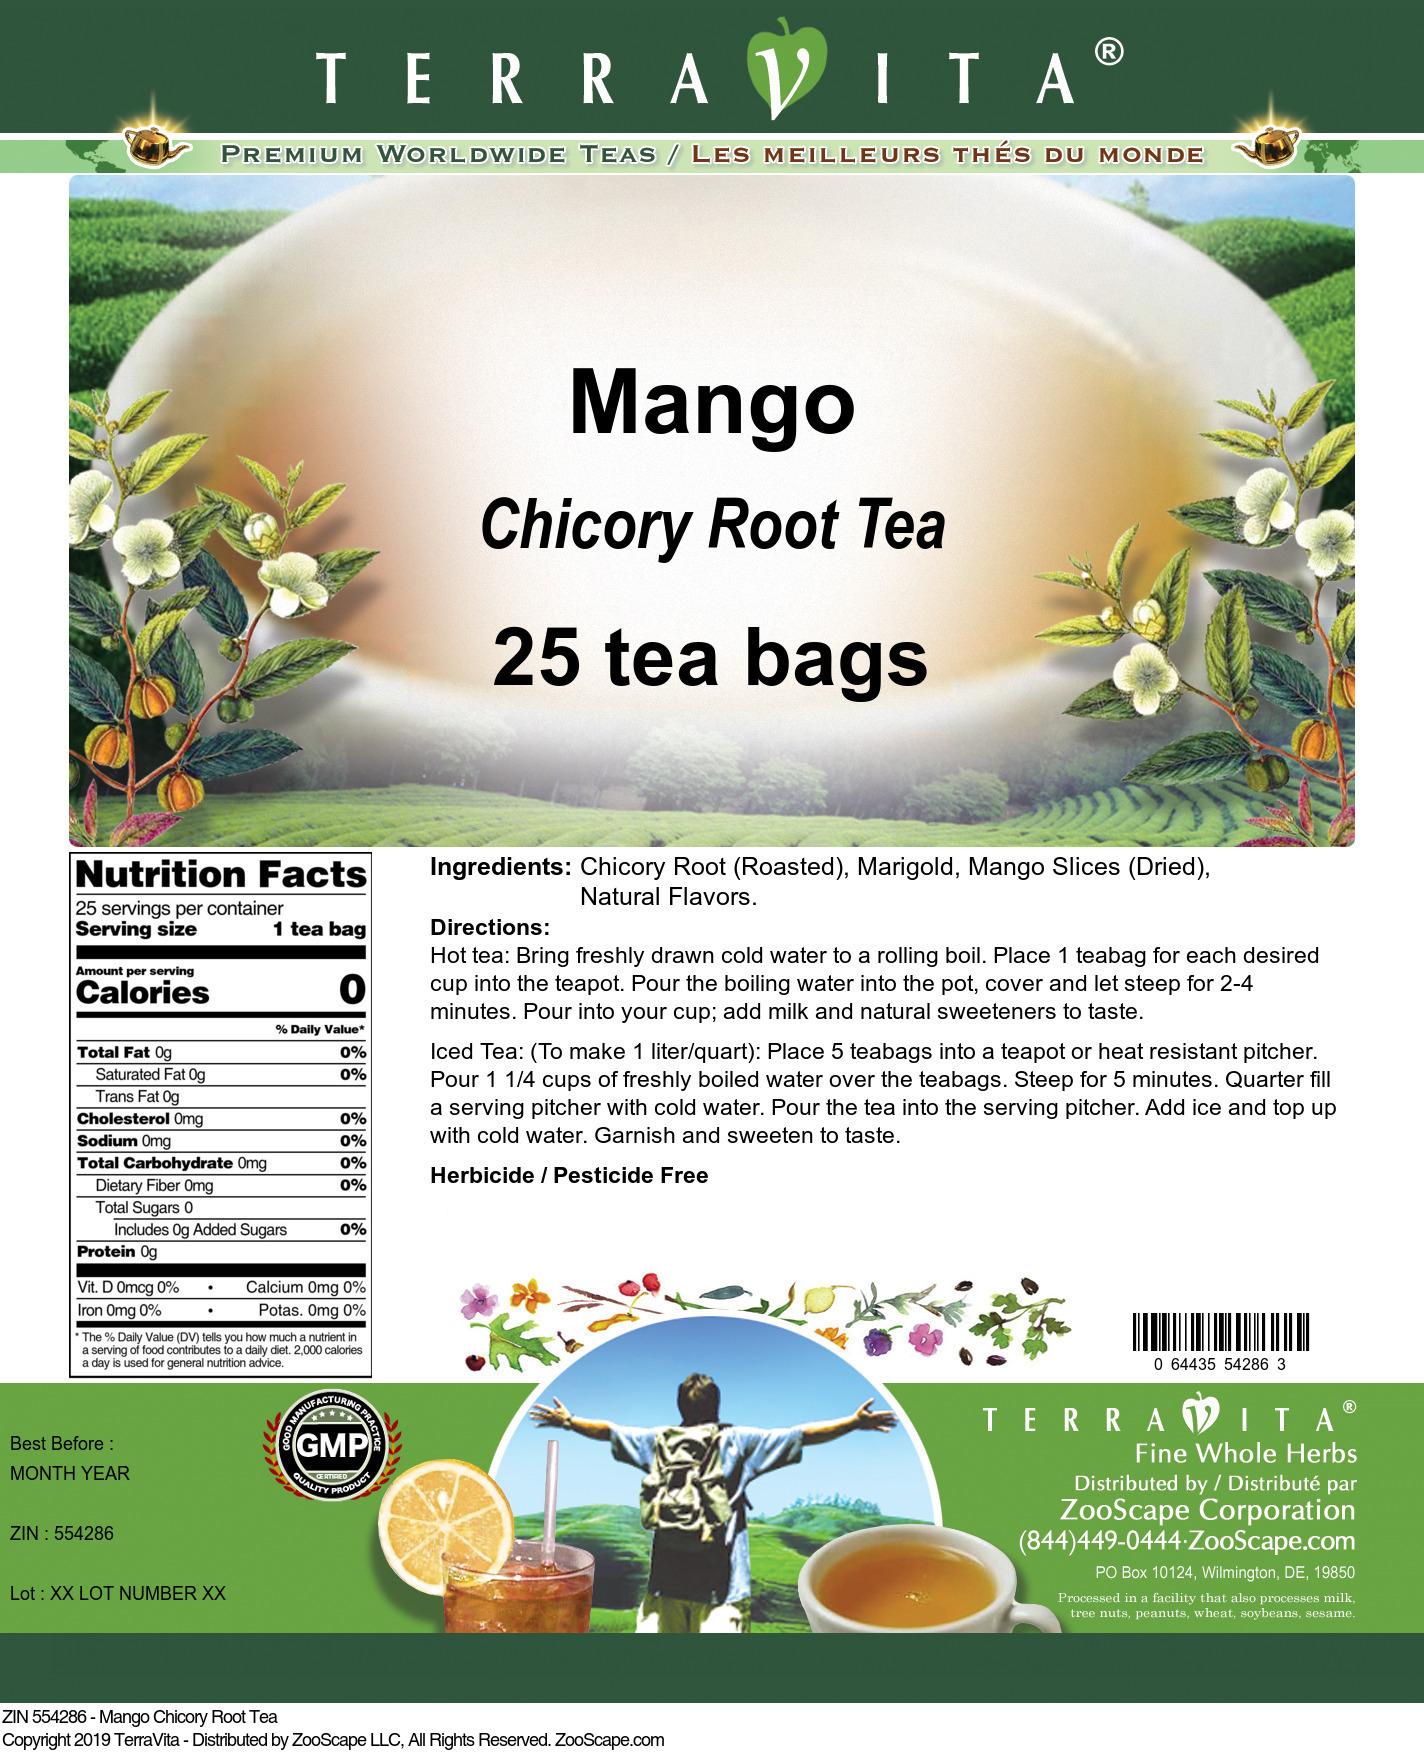 Mango Chicory Root Tea